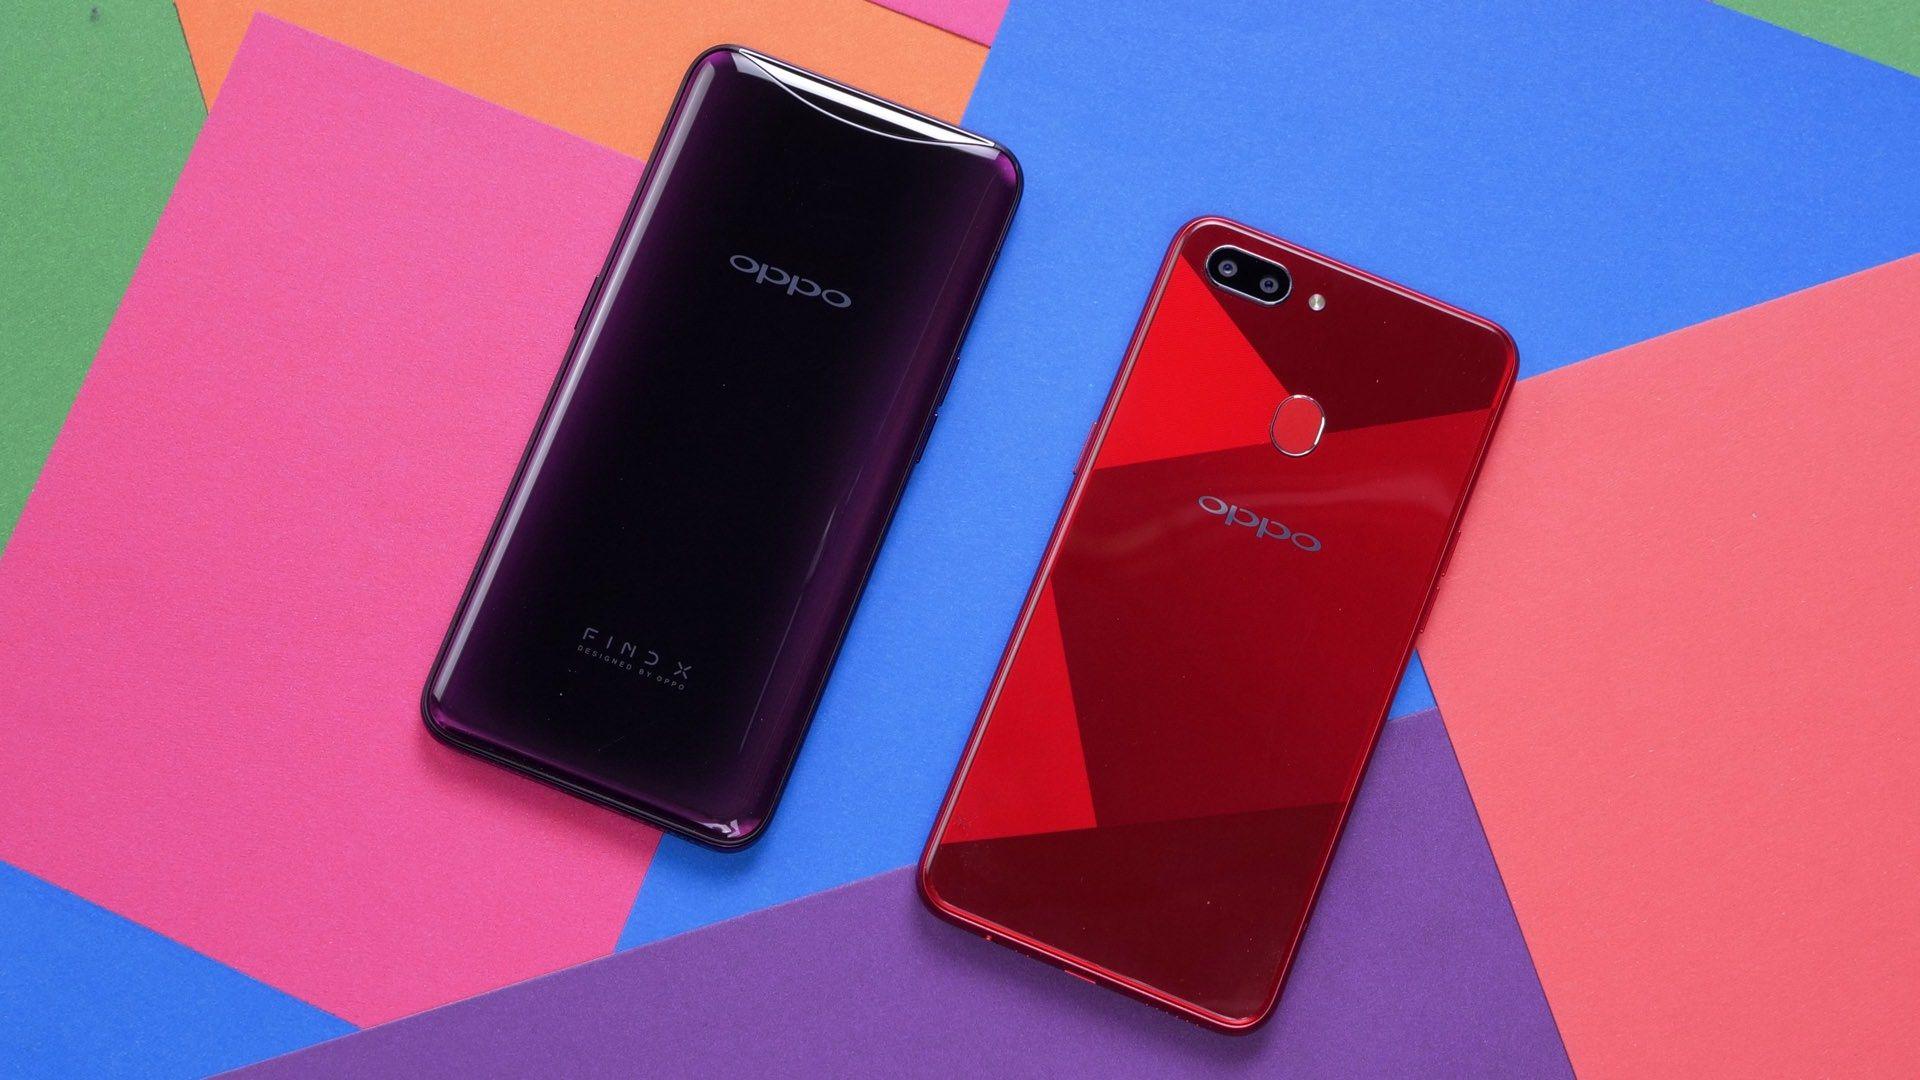 Смартфон Oppo A5s: достоинства и недостатки, сравнение с Oppo A5